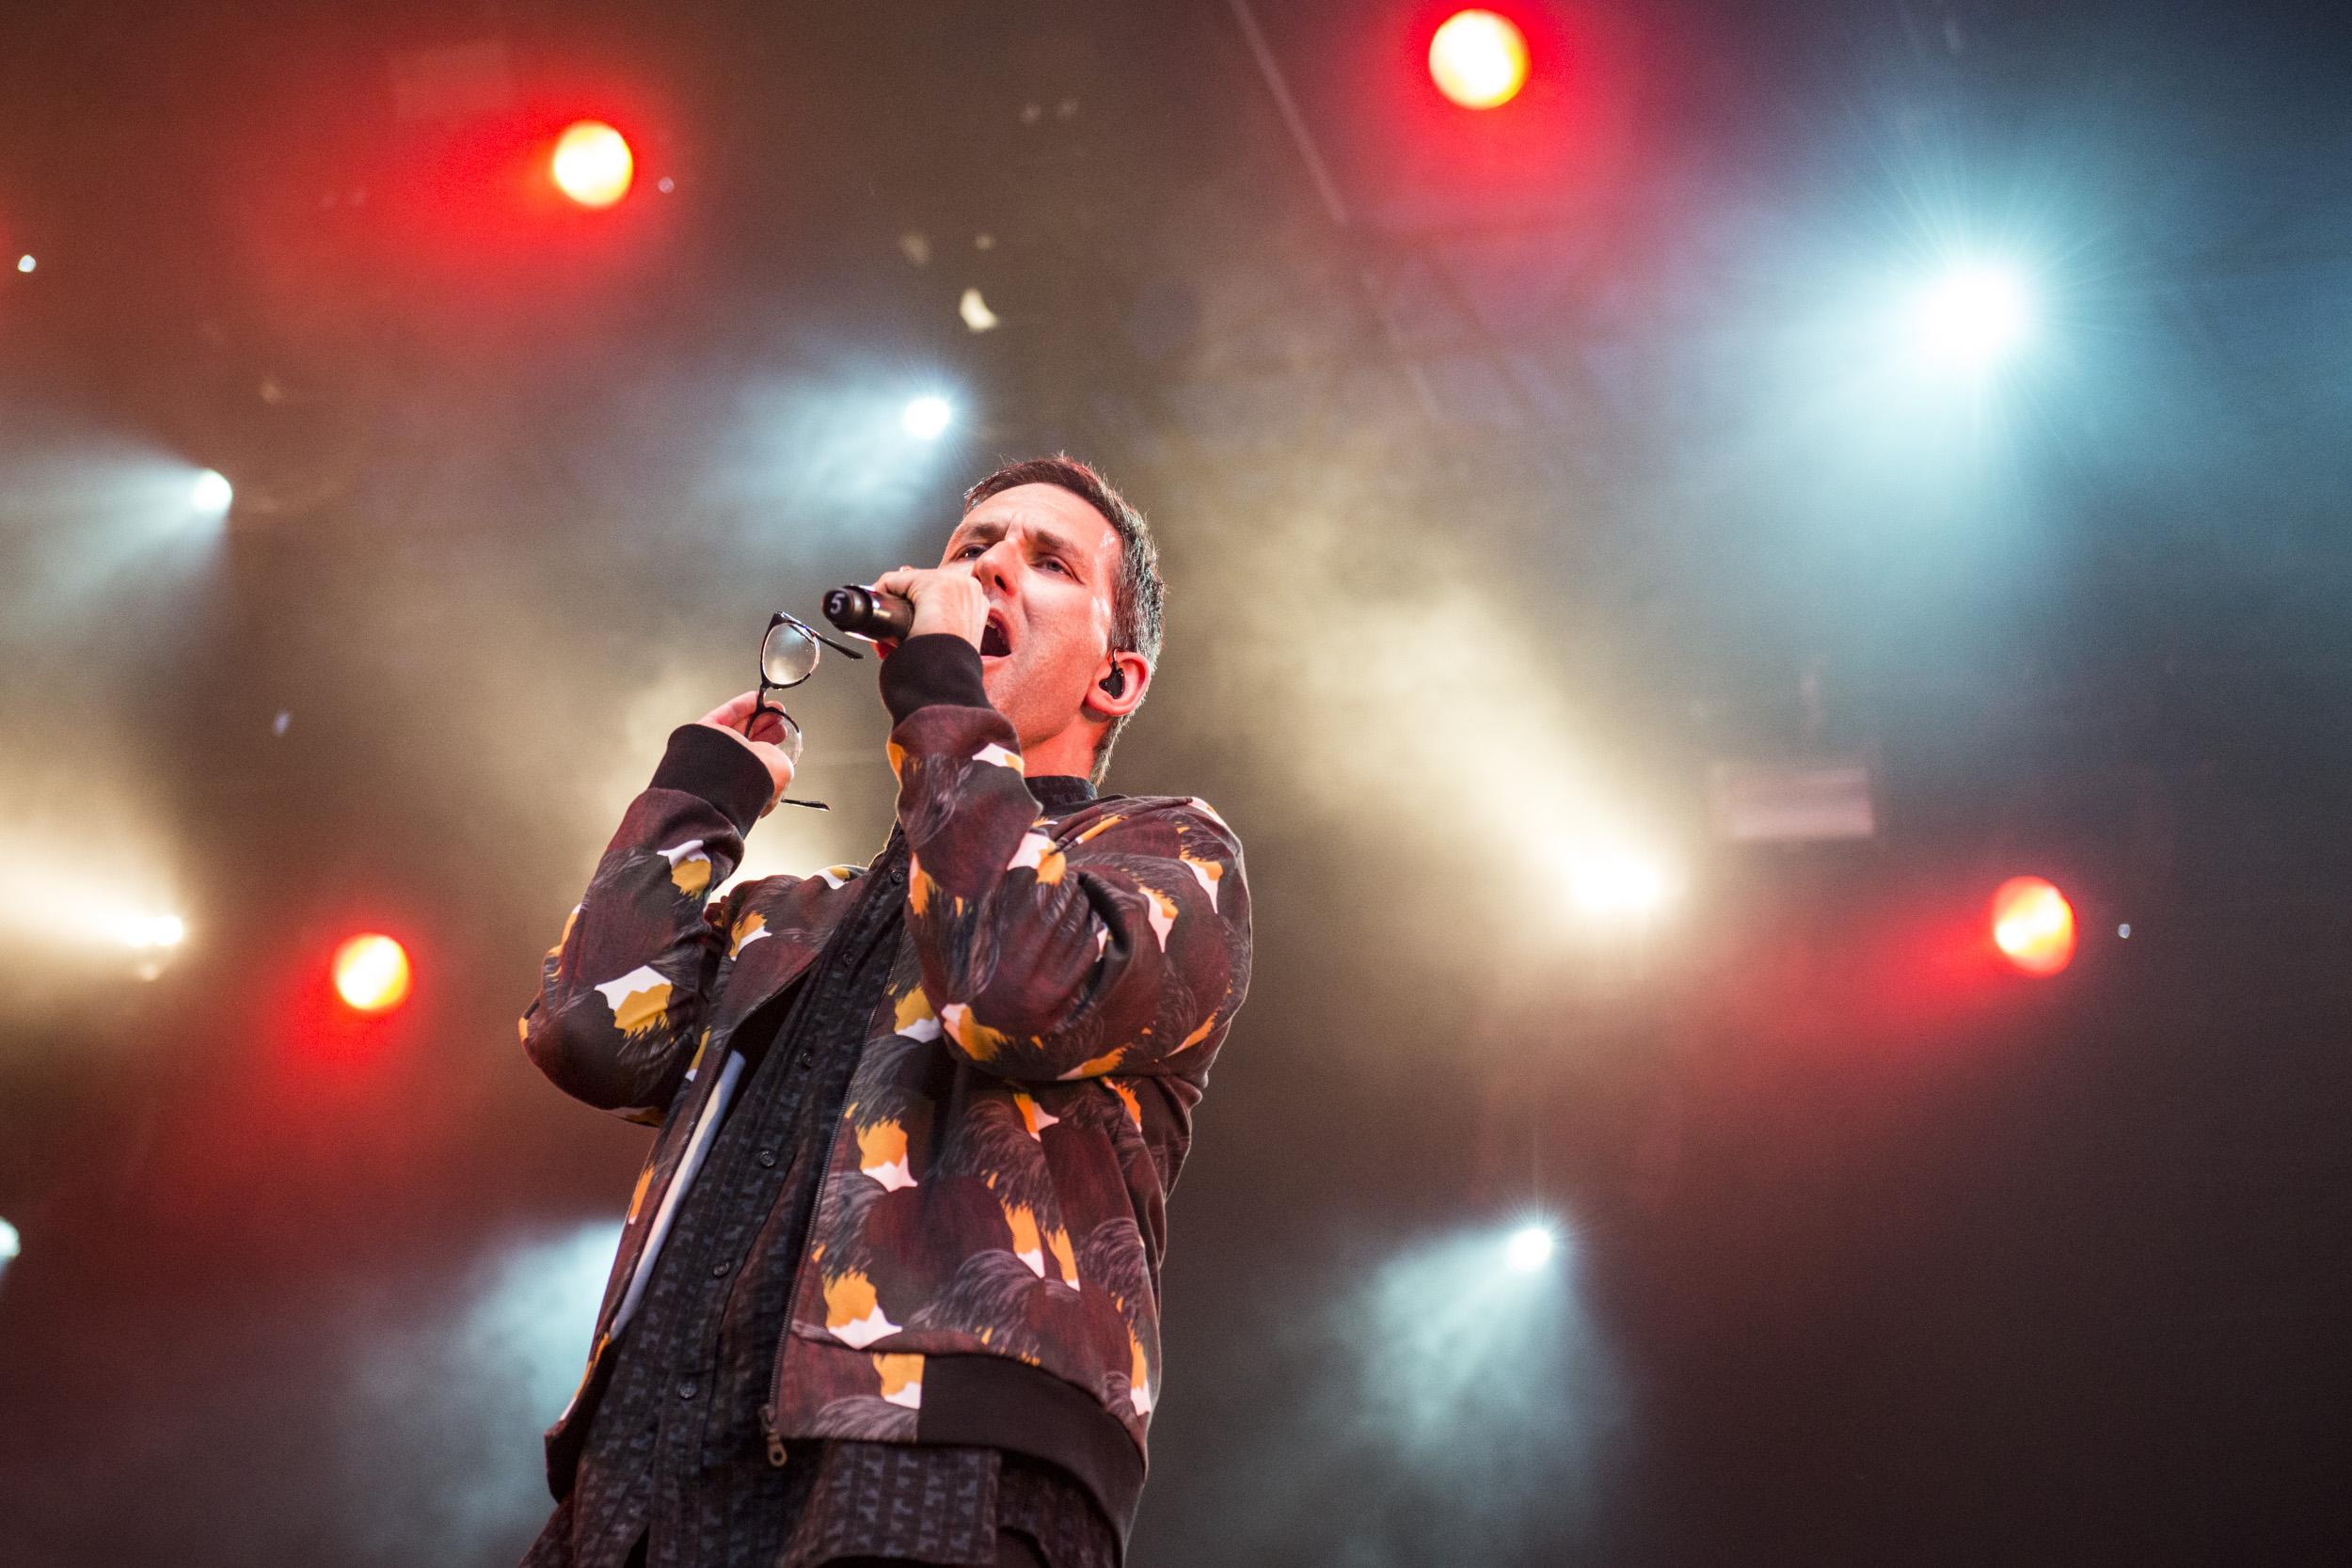 Jamie Lidell @ Cactusfestival 2017, Dag 2 (Nick De Baerdemaeker)